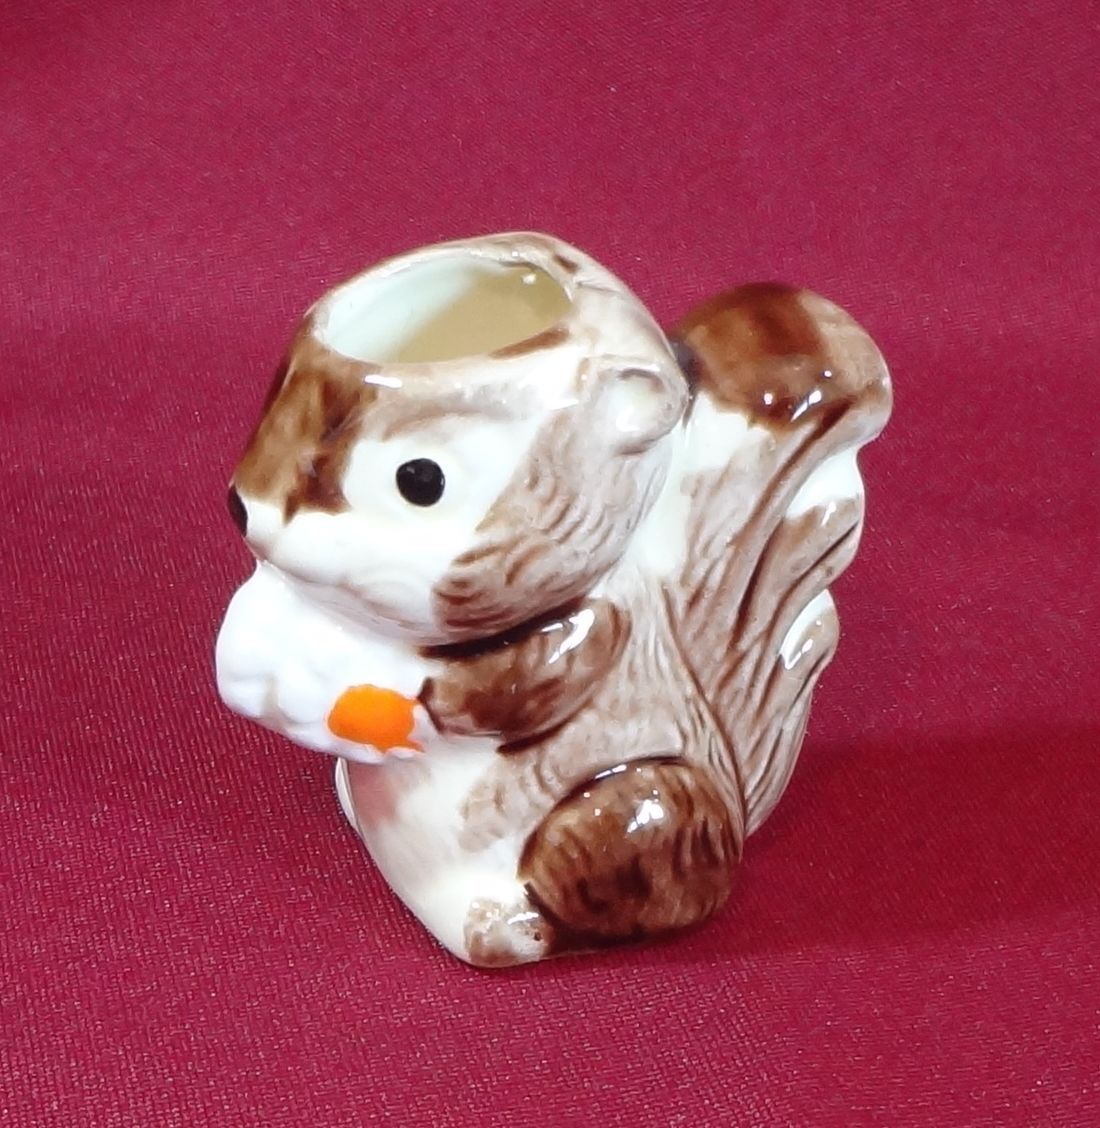 Enesco Japan Ceramic Squirrel Toothpick Holder Vintage 1980 - $9.99